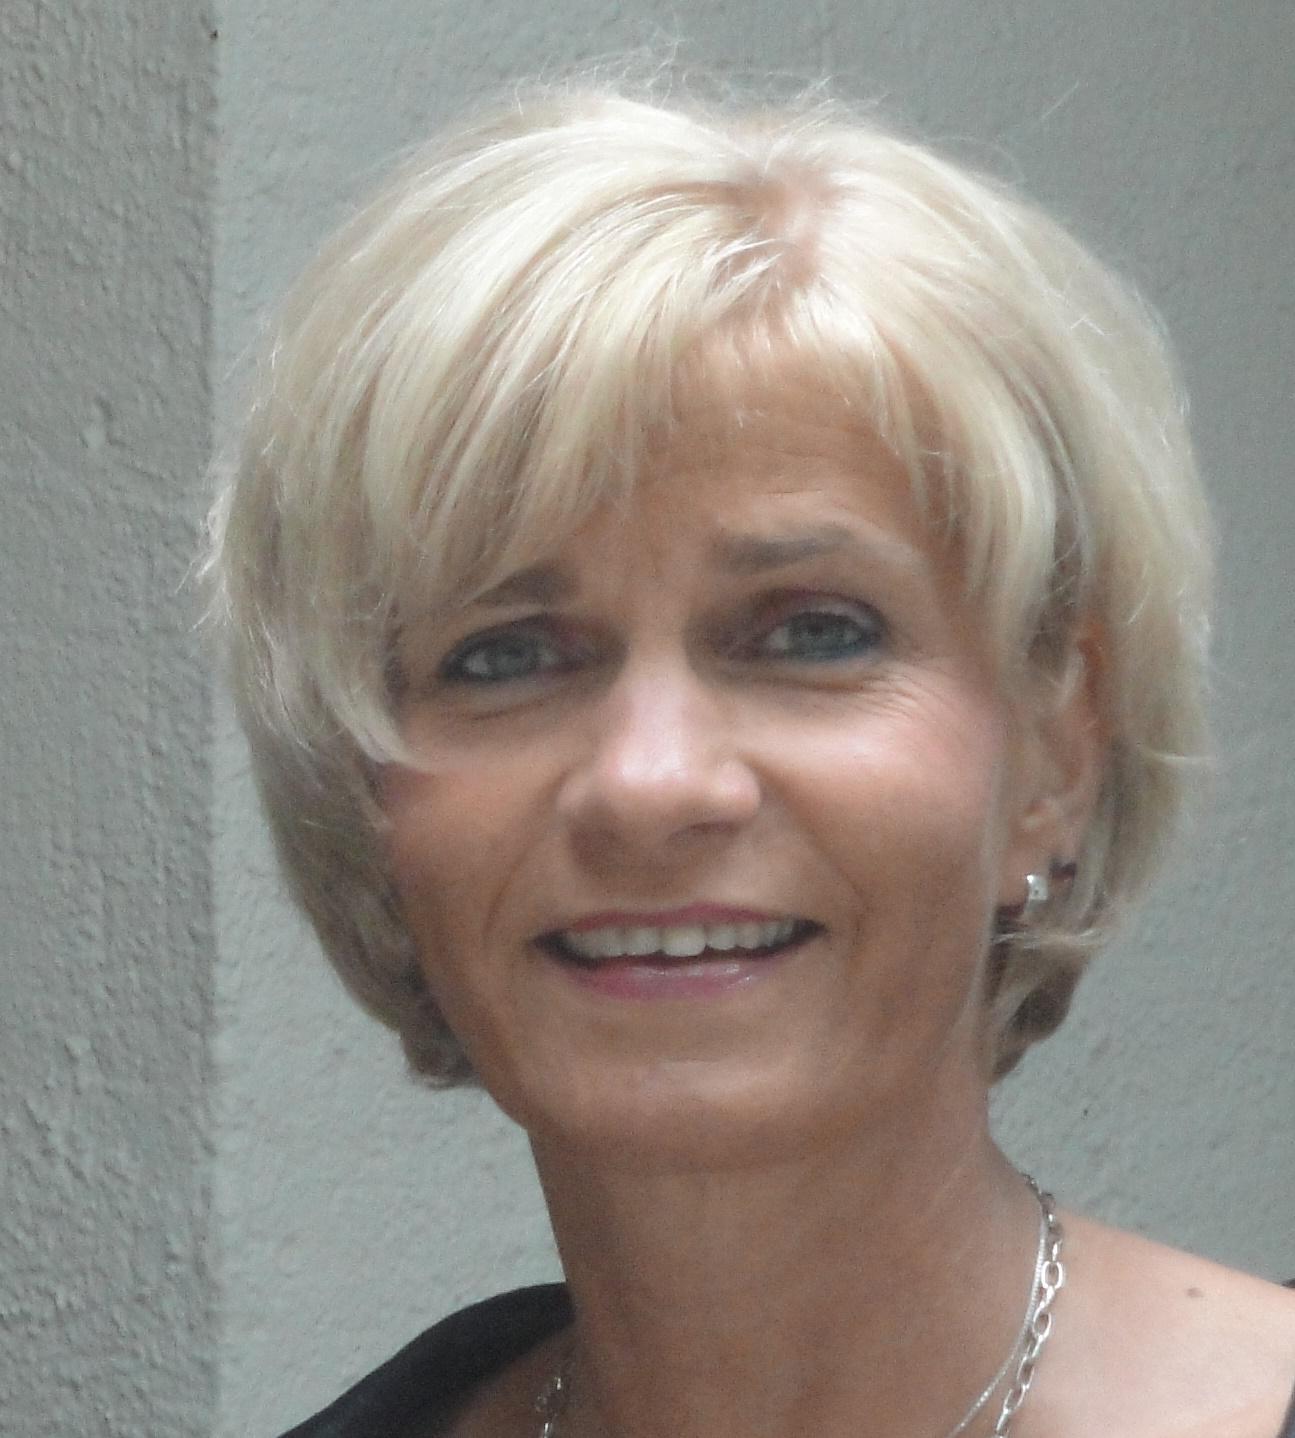 Sabine Koslowski